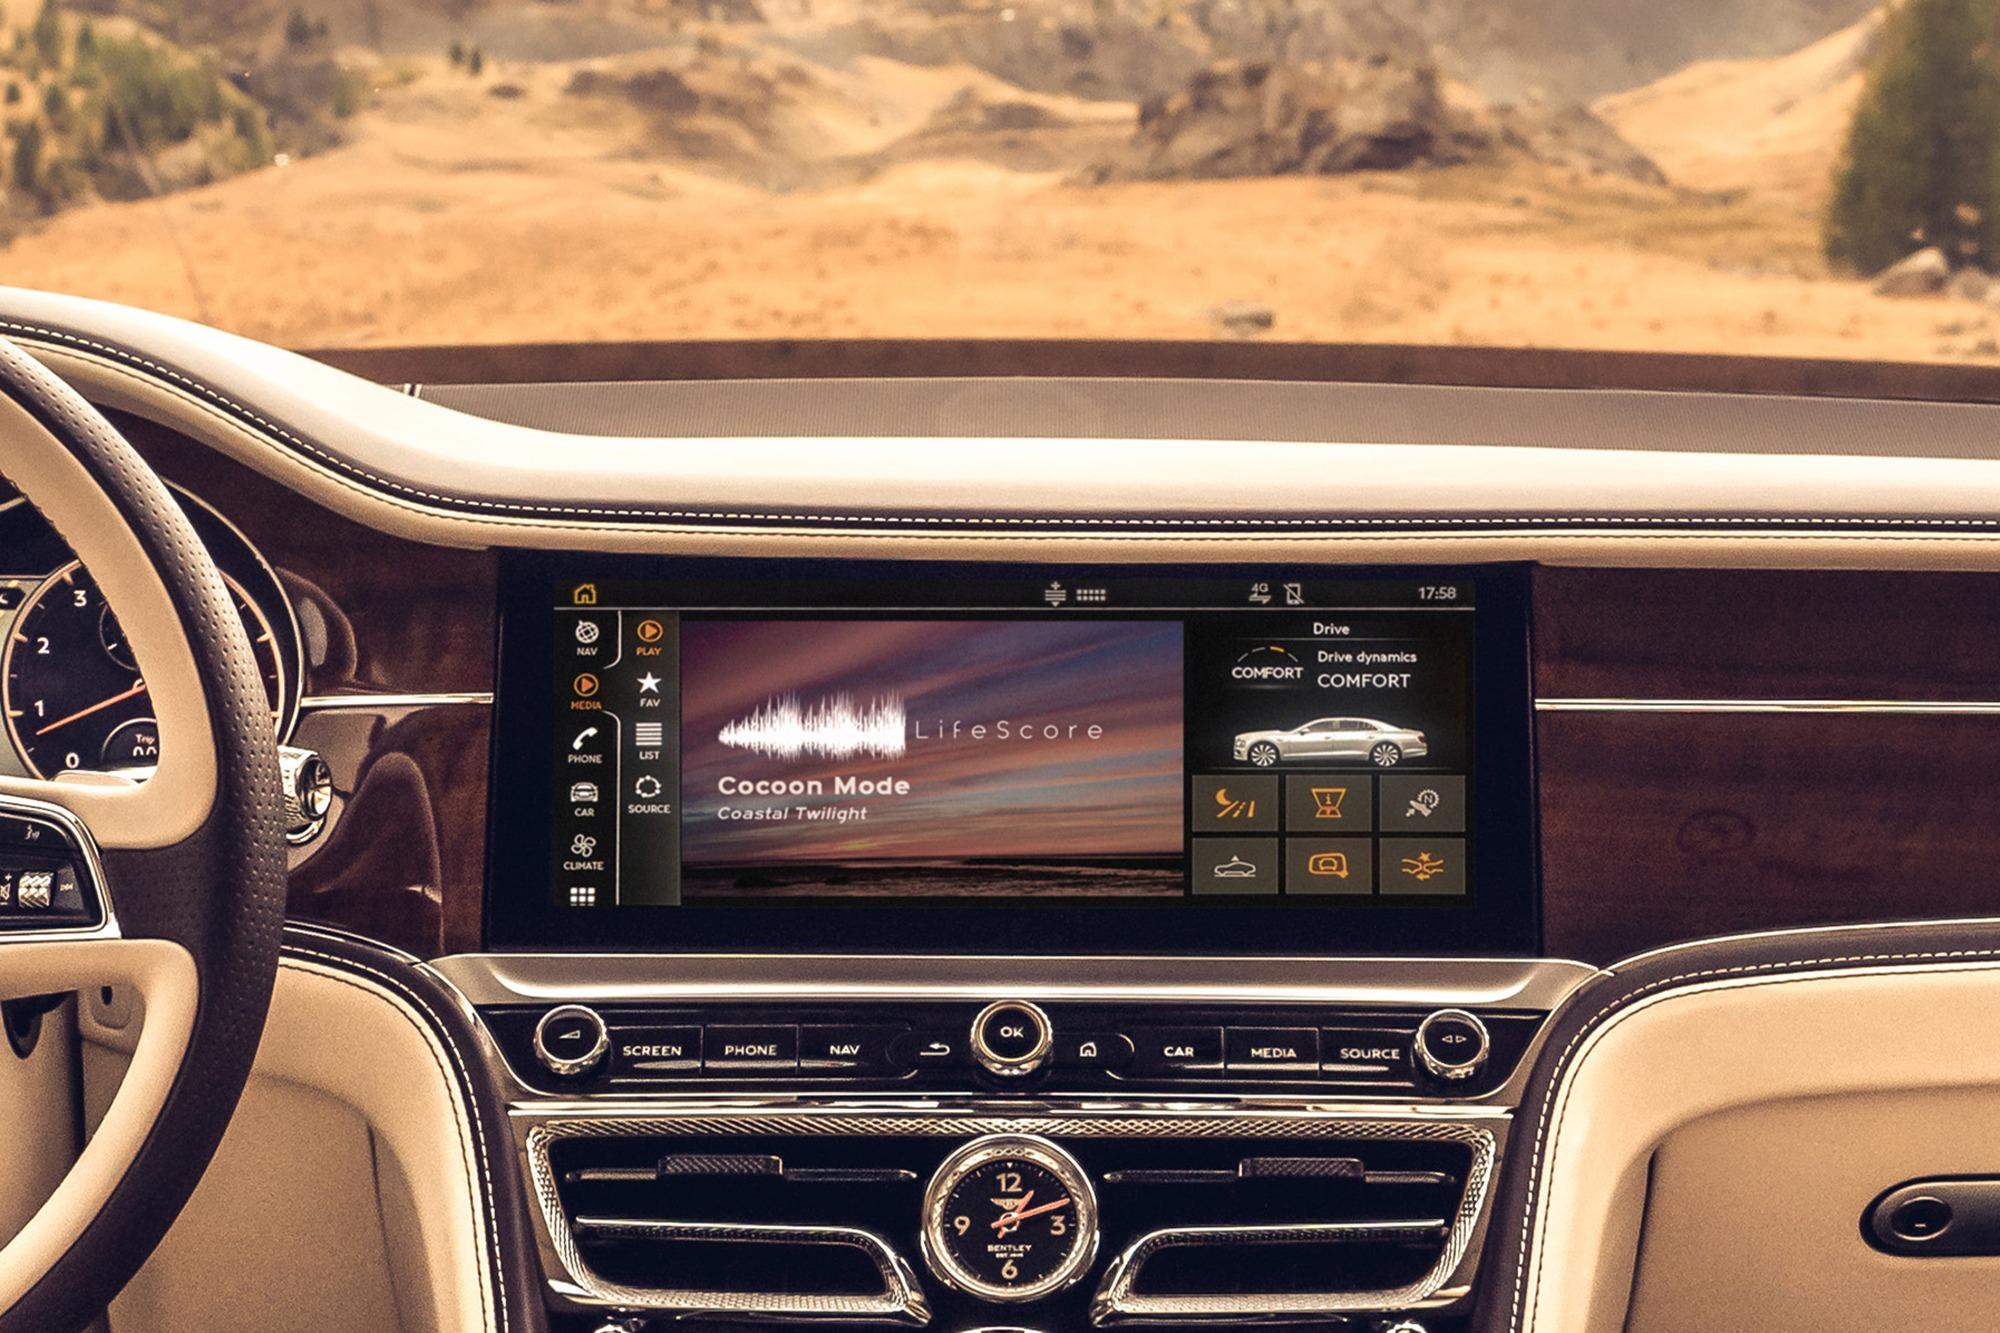 Painel de modelo Bentley com central multimídia escrito LifeScore